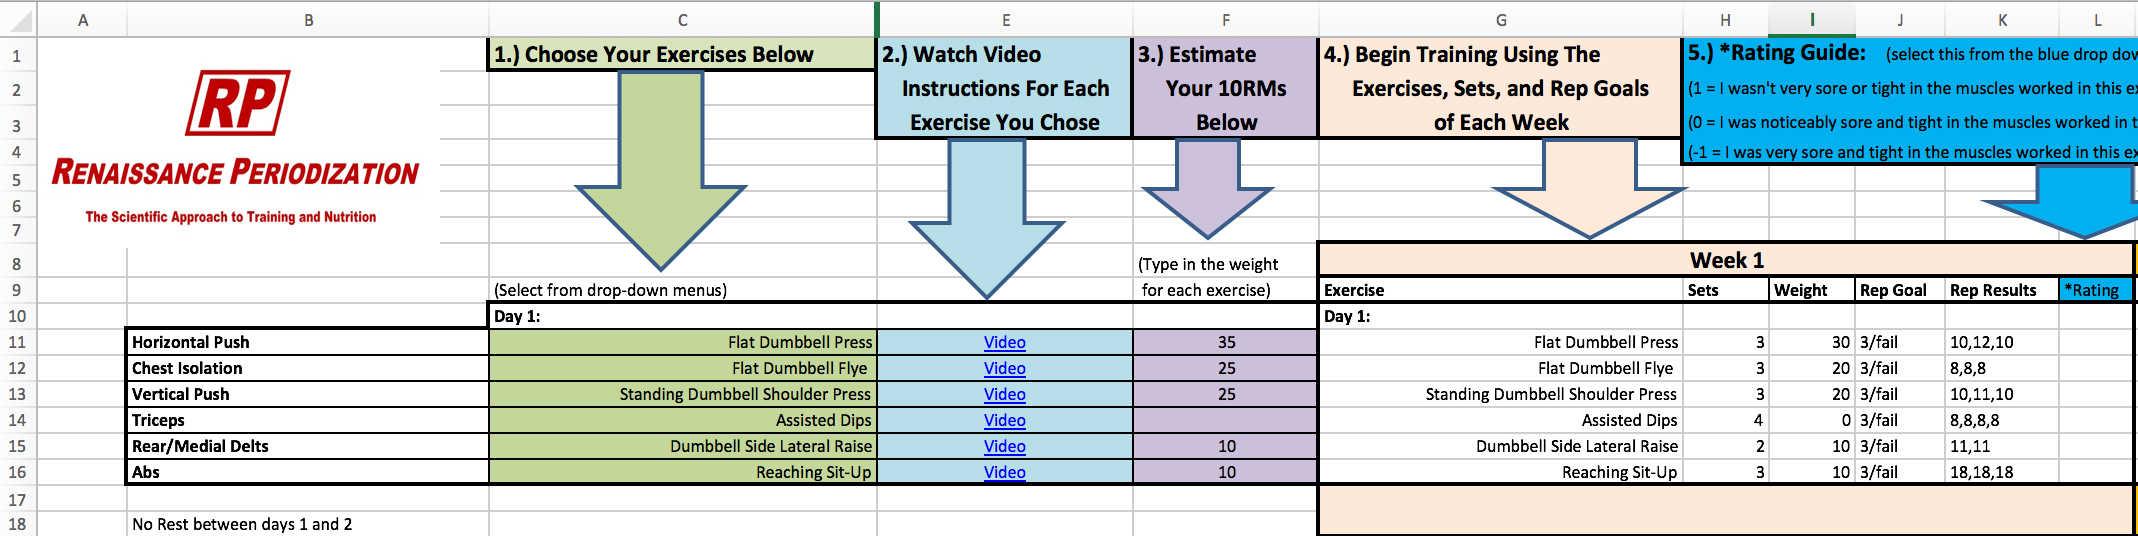 Renaissance Diet Spreadsheet Free Regarding Strength Training, My Current Program And How I Chose It.